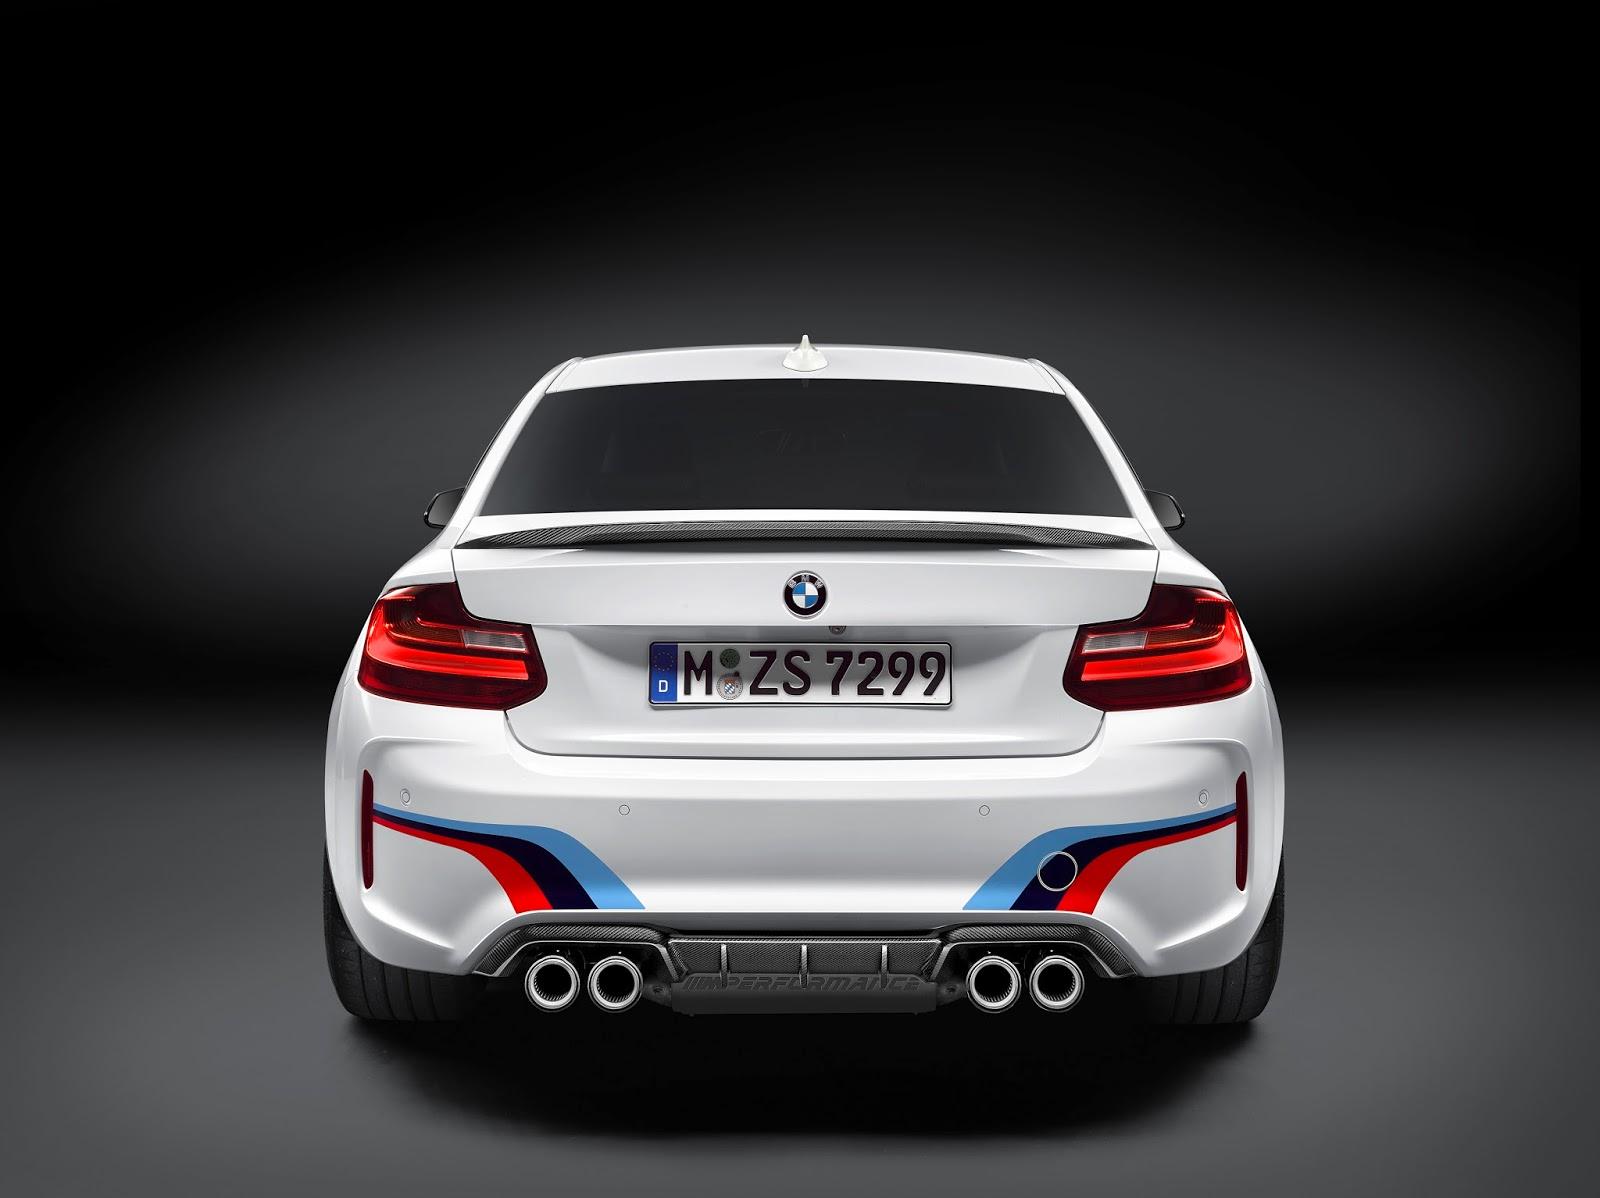 P90207896 highRes the new bmw m2 coupe Νέα Αξεσουάρ M Performance για τη νέα BMW M2 Coupé. BMW, BMW M2, BMW M2 Coupé, Αξεσουάρ